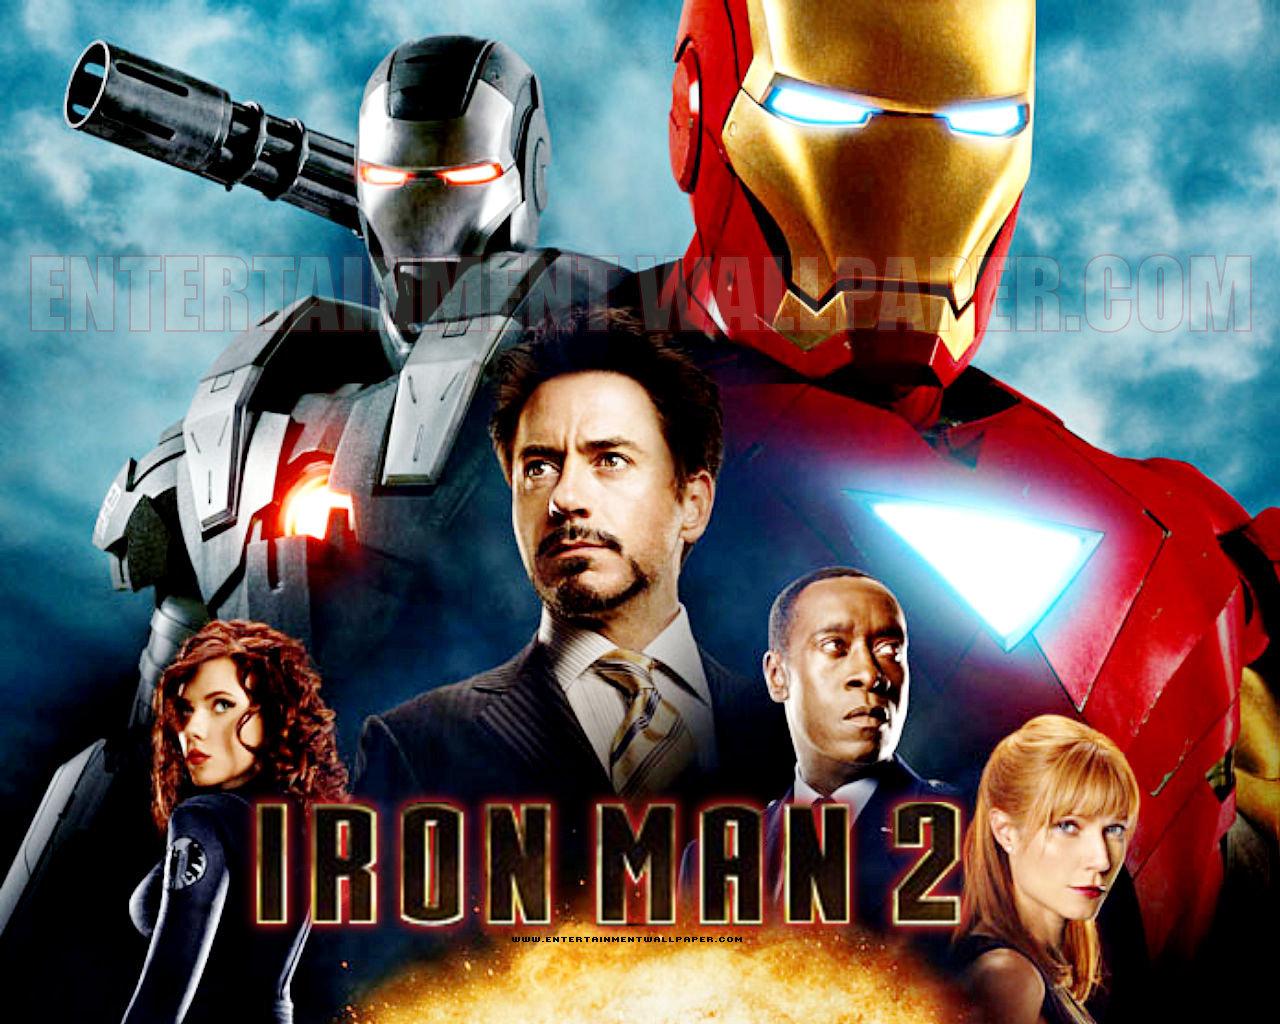 Iron Man 2 2010 Iron Man Wallpaper 11876043 Fanpop